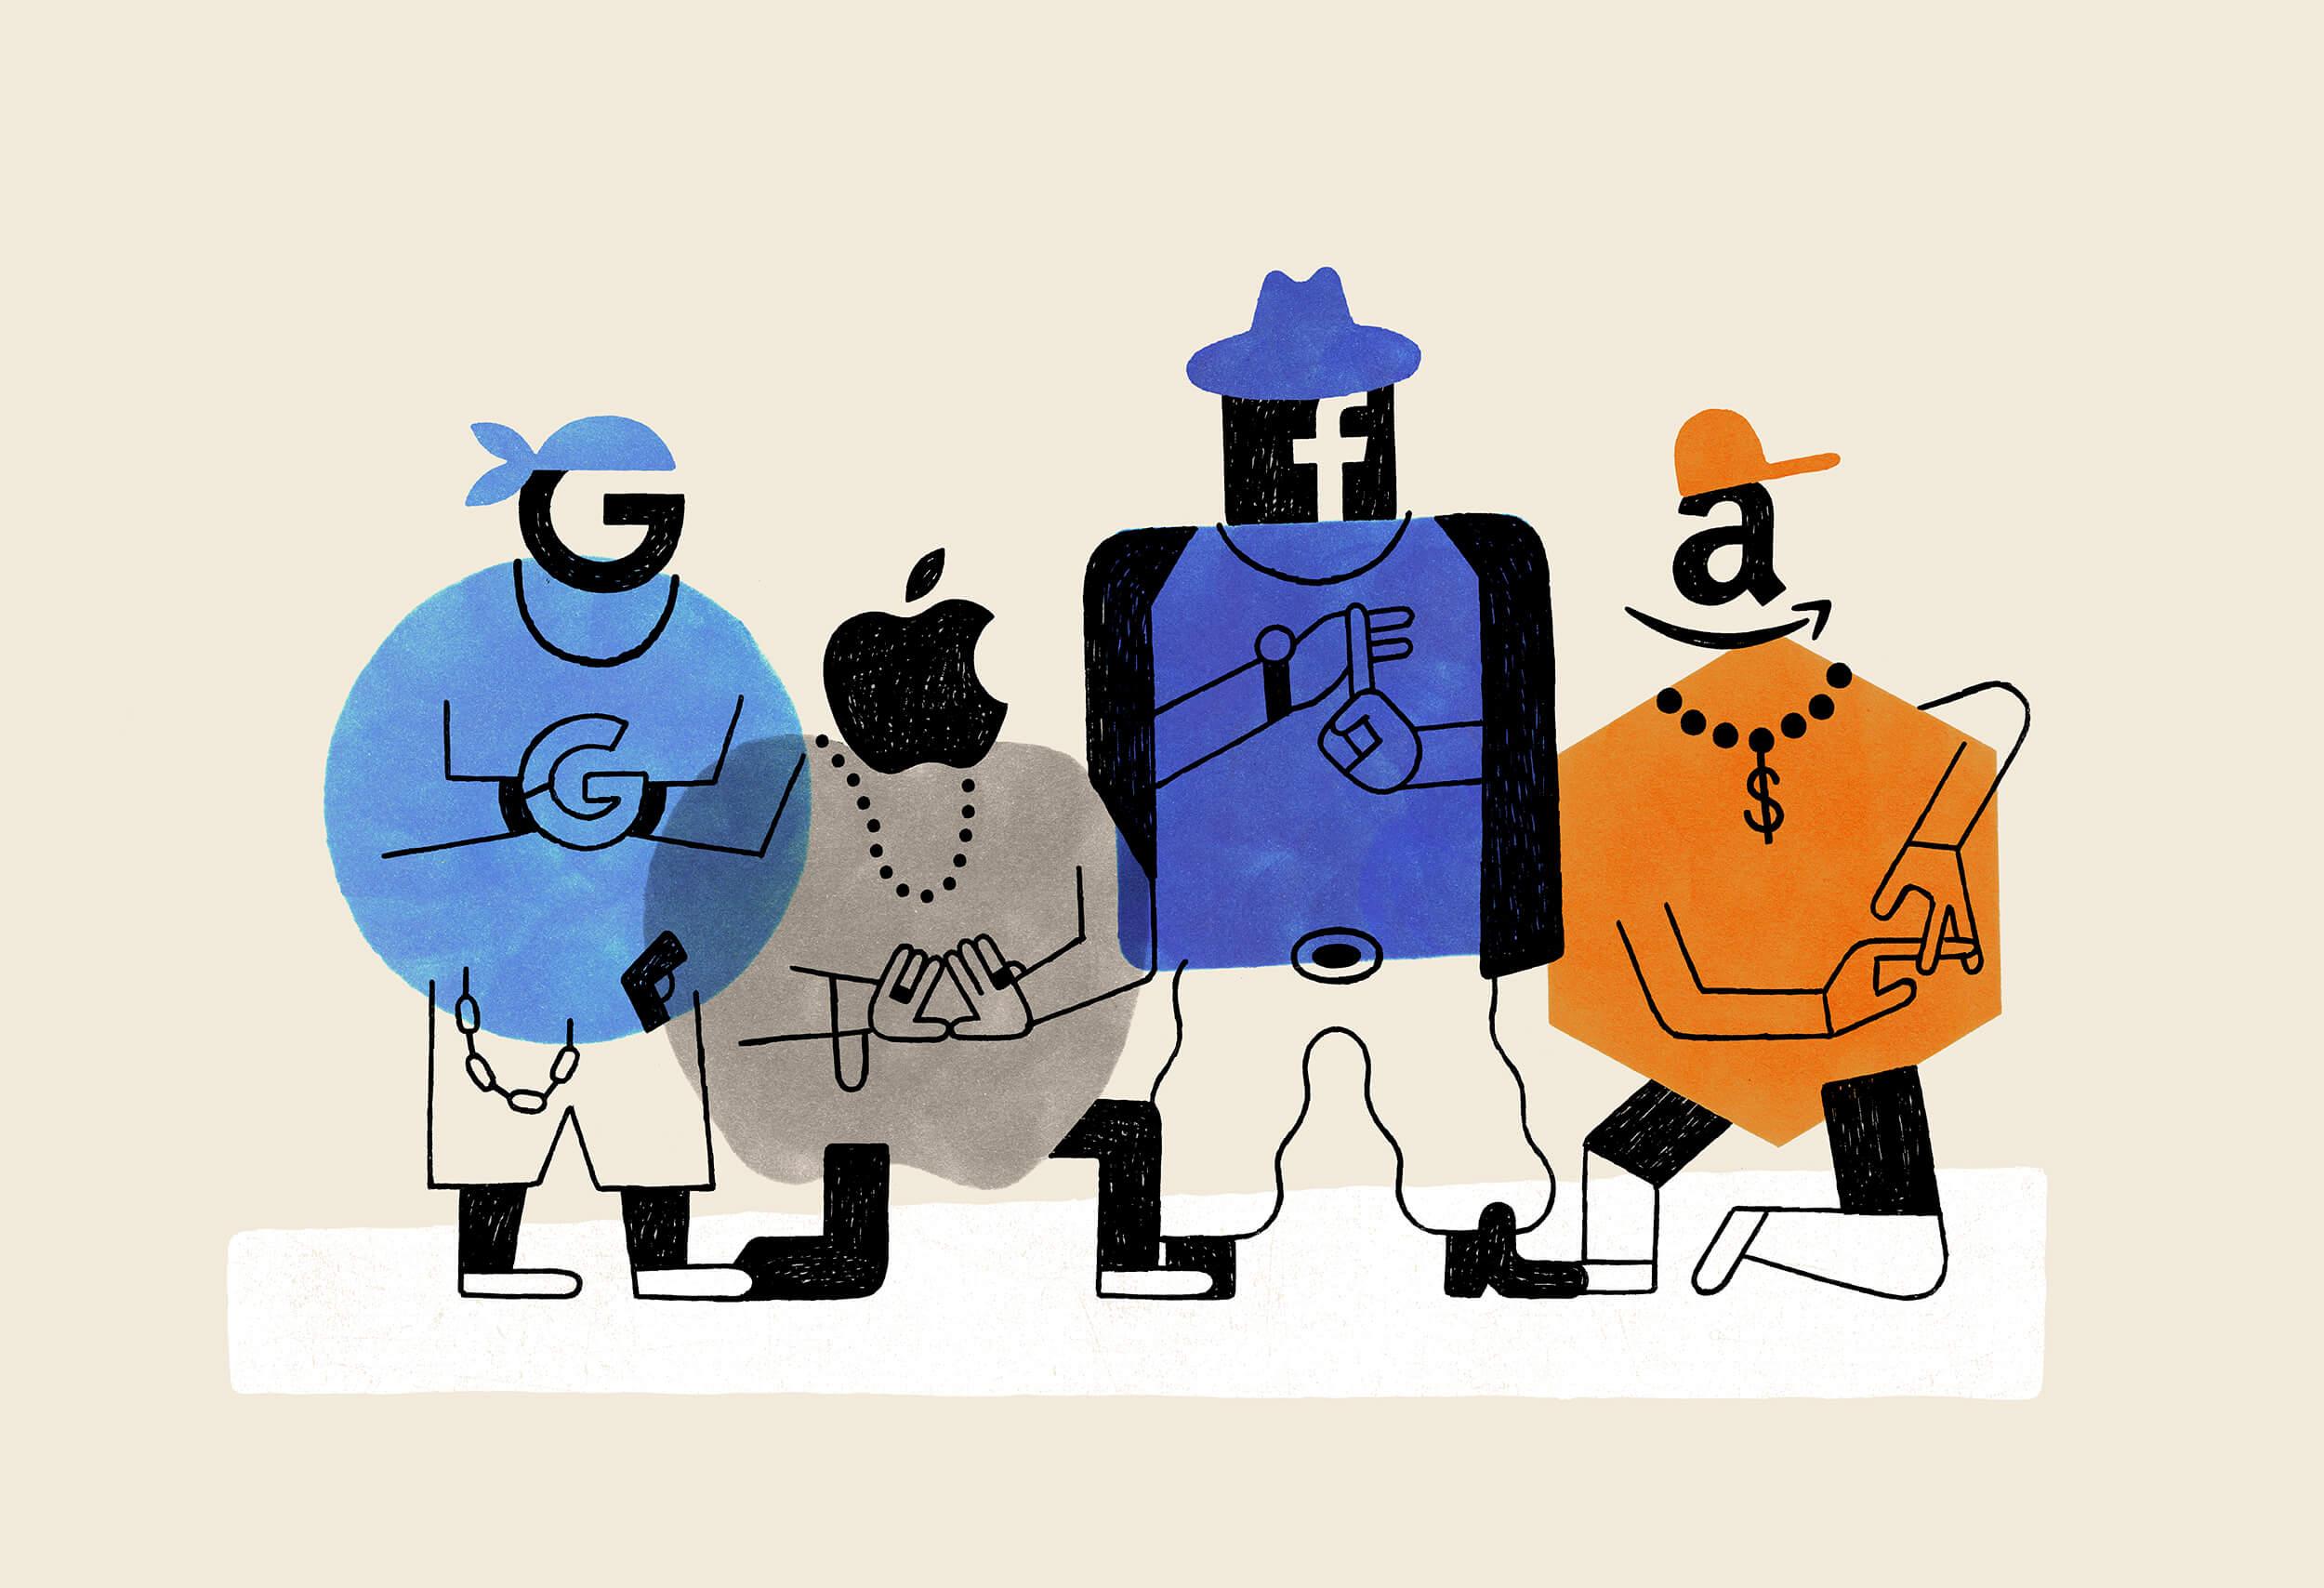 miguel porlan, illustration, gafa, alternatives economiques